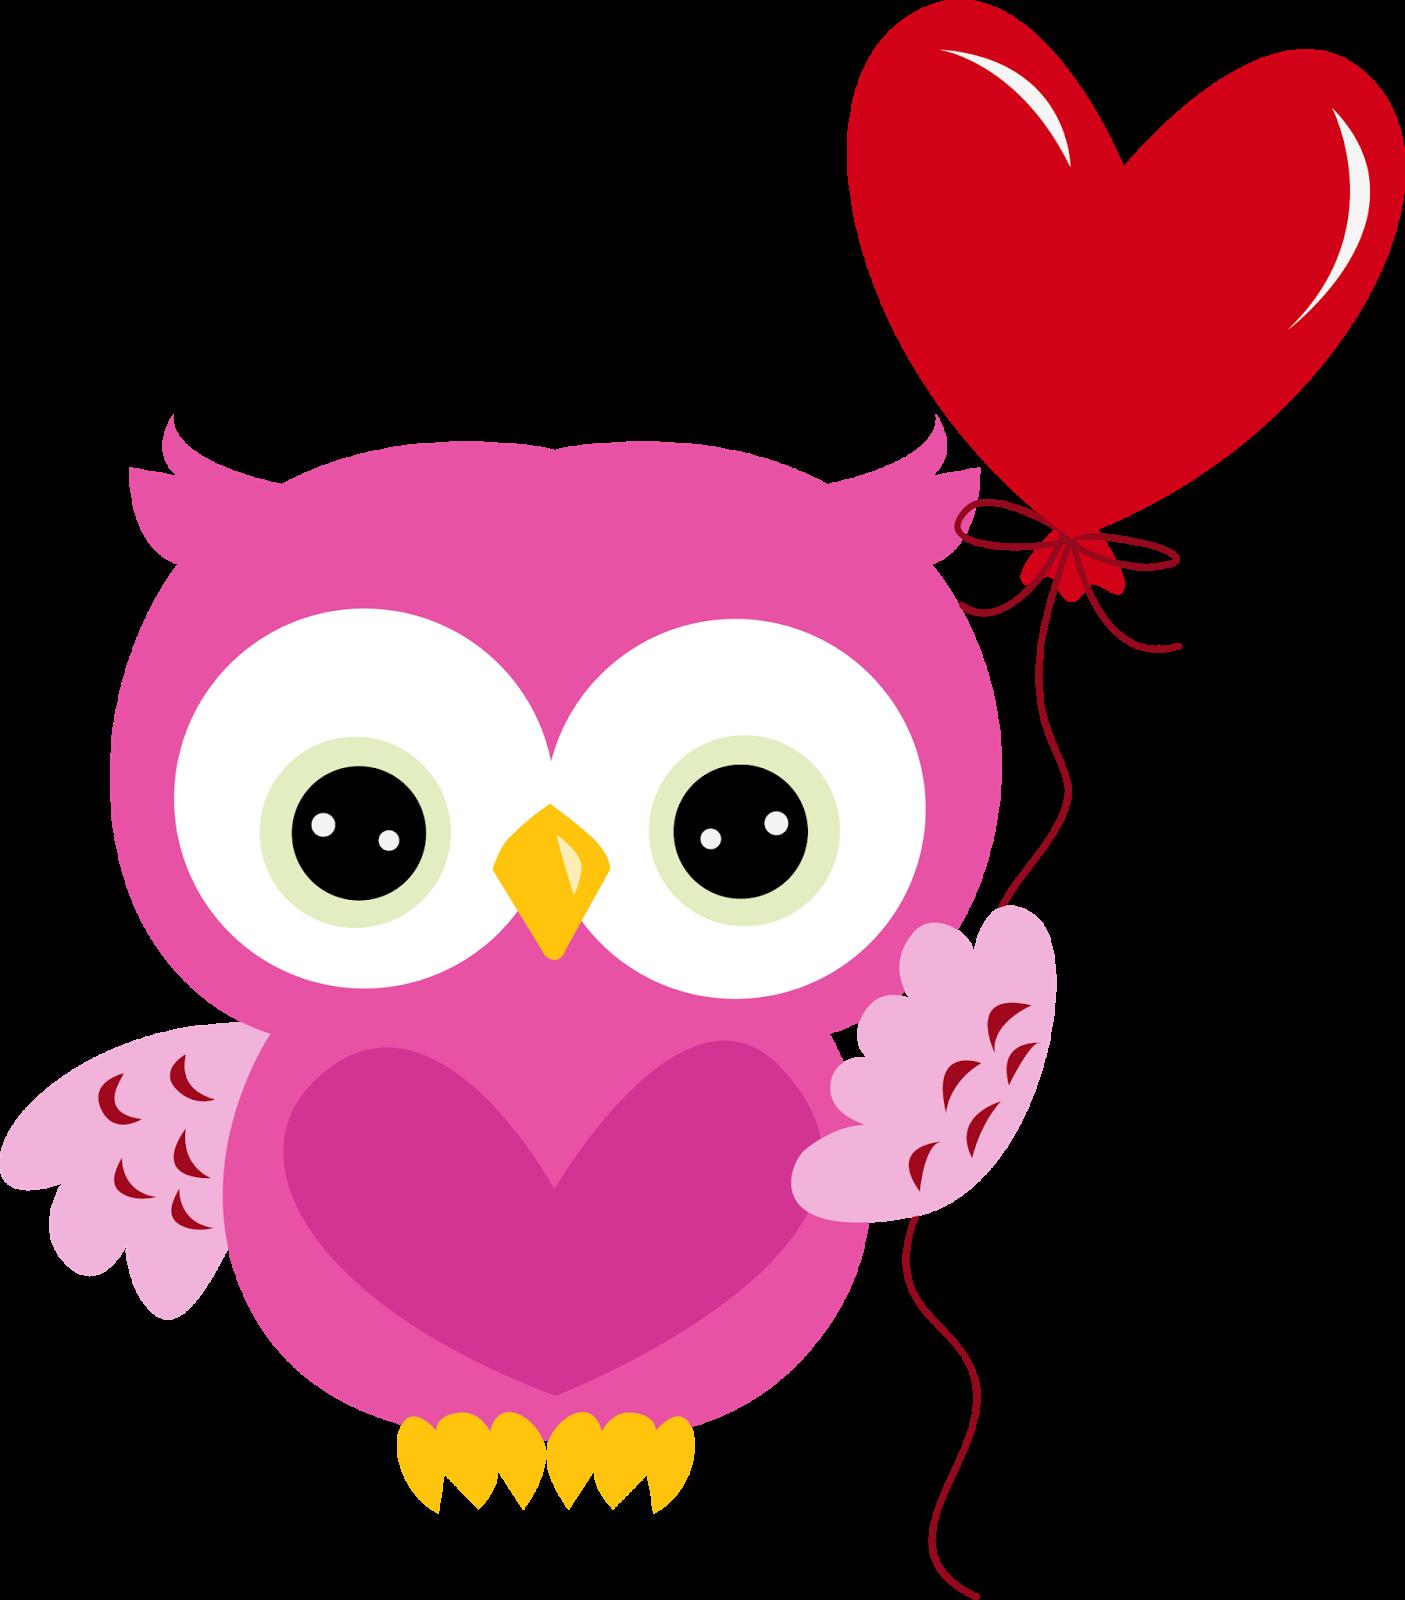 Clipart owl valentines day. Valentine s parties noah